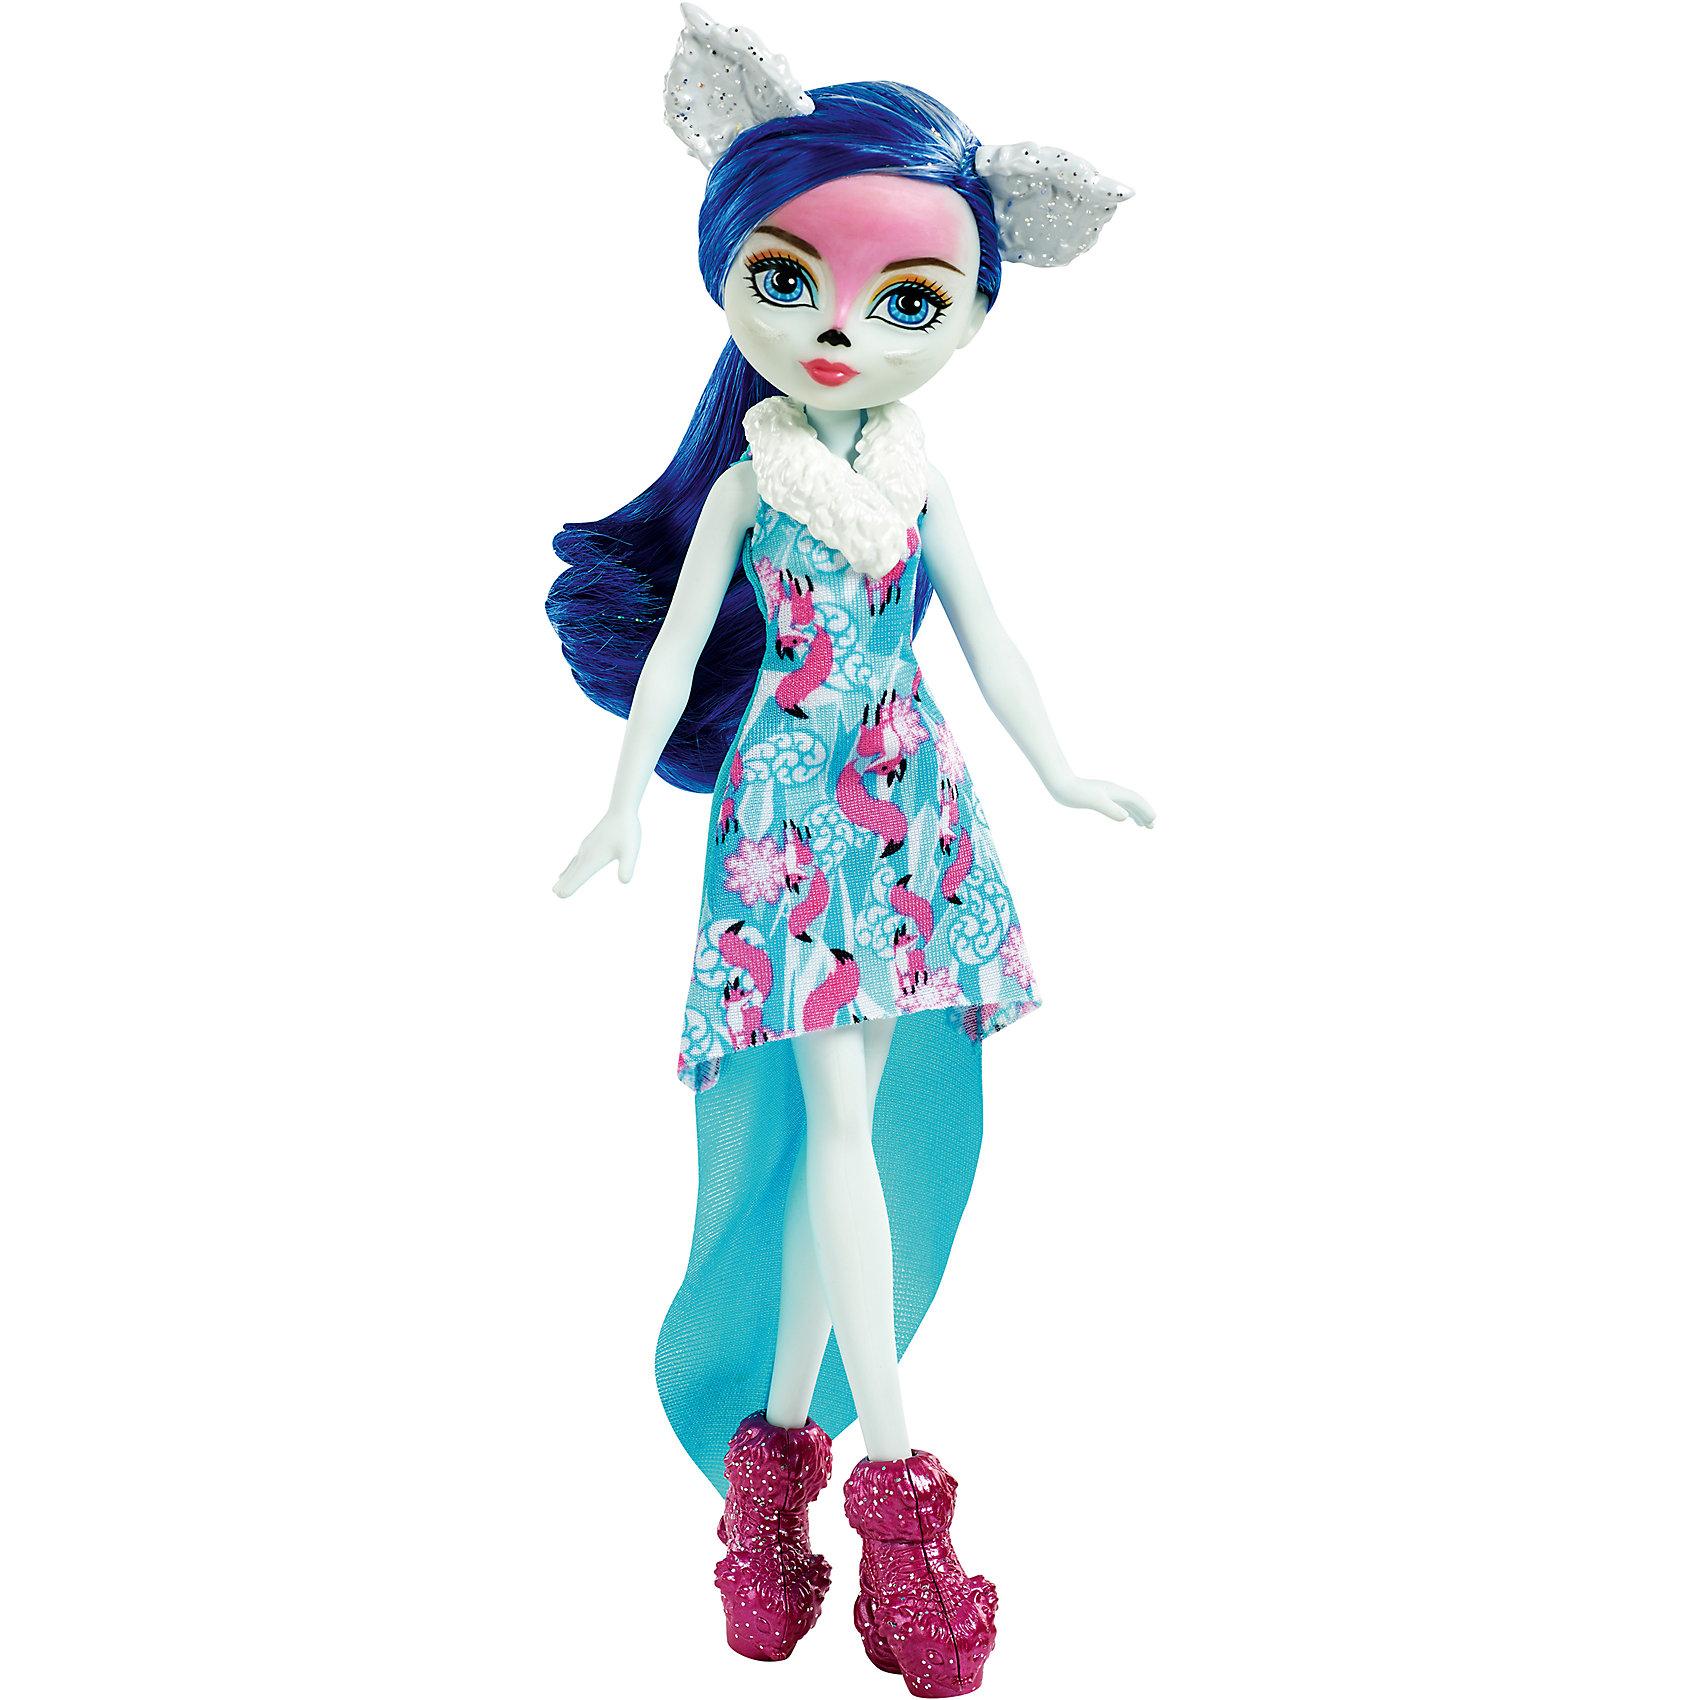 Mattel Кукла-пикси Фоксан из коллекции Заколдованная зима, Ever After High mattel кукла эппл уайт ever after high